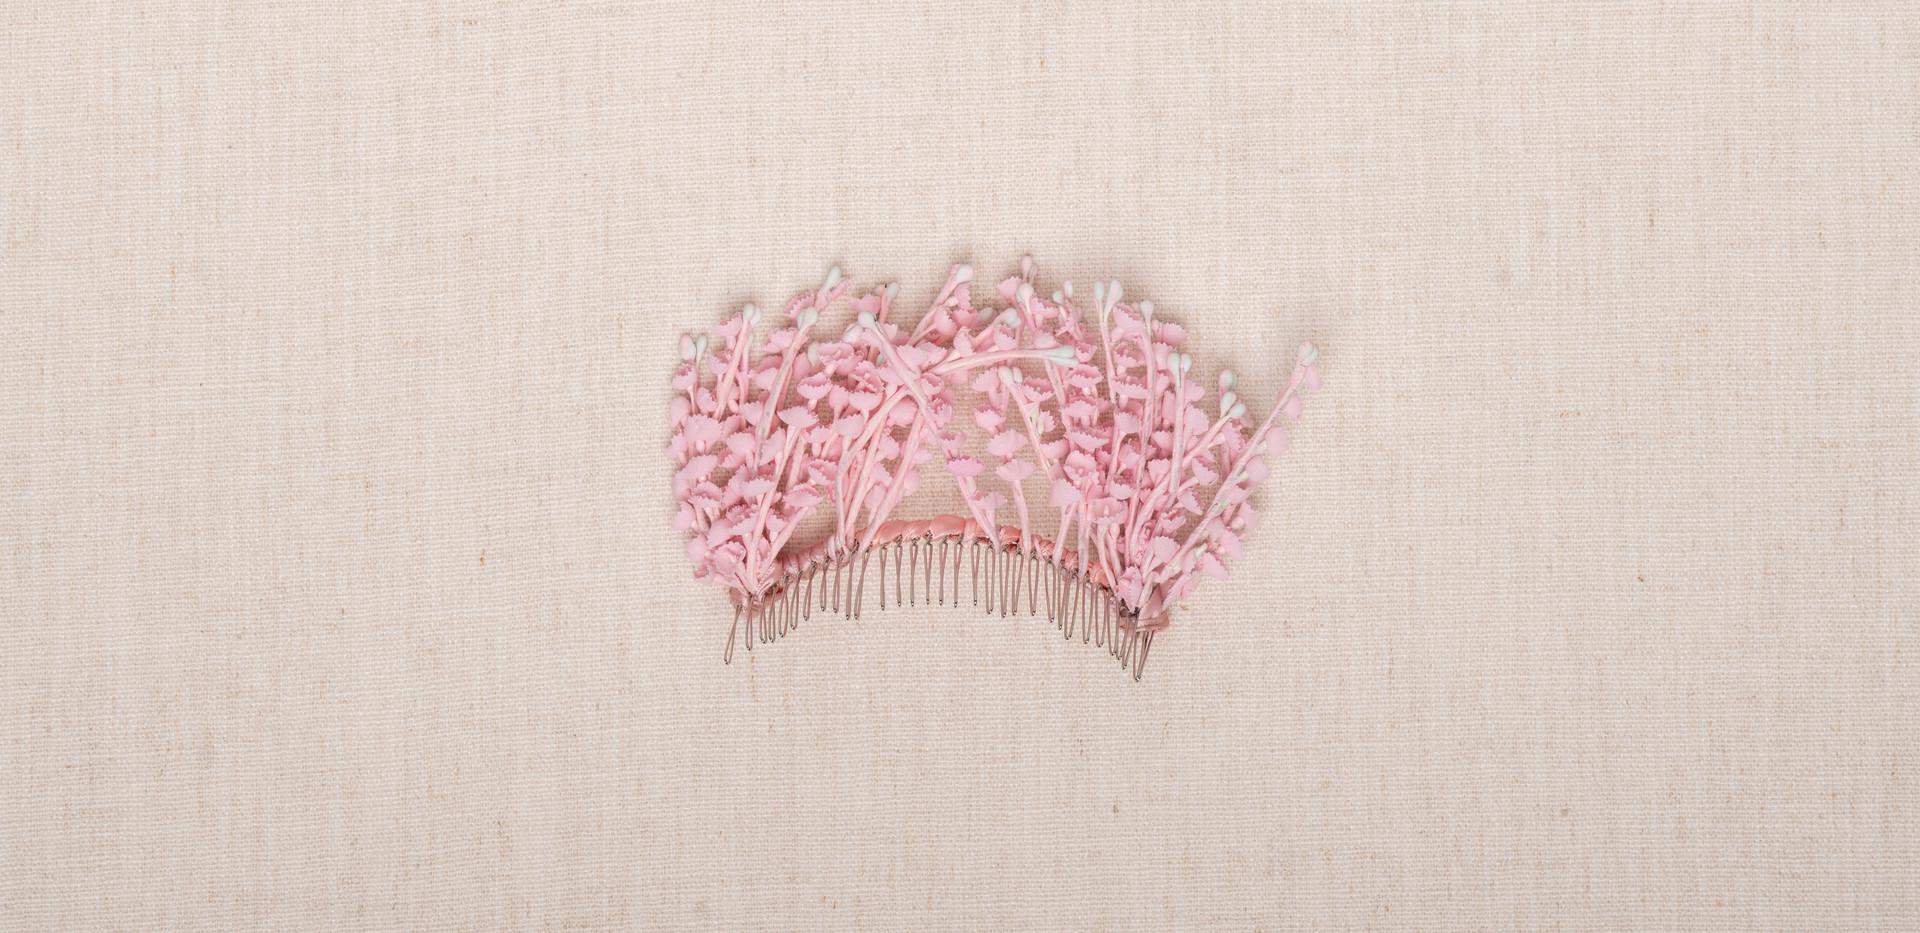 CLassic Comb Pink (2).JPG